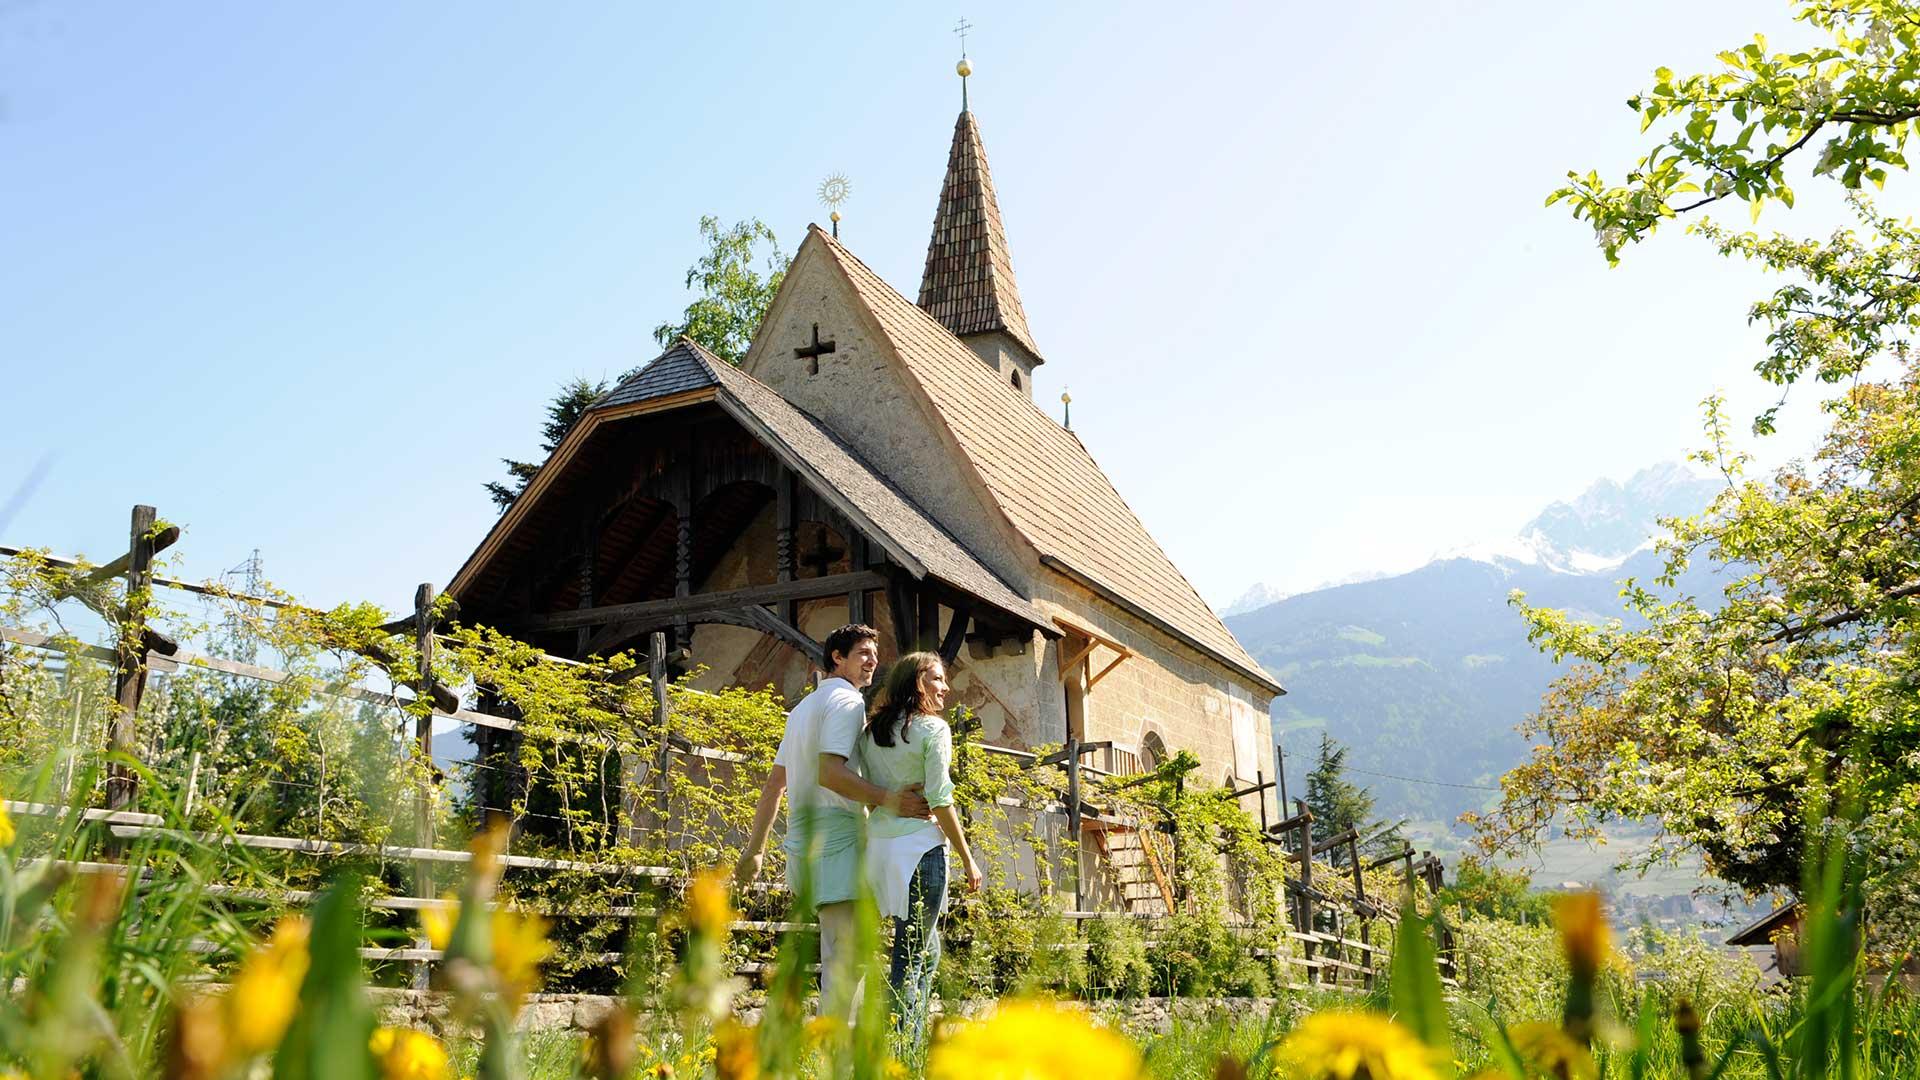 Spaziergang in Dorf Tirol